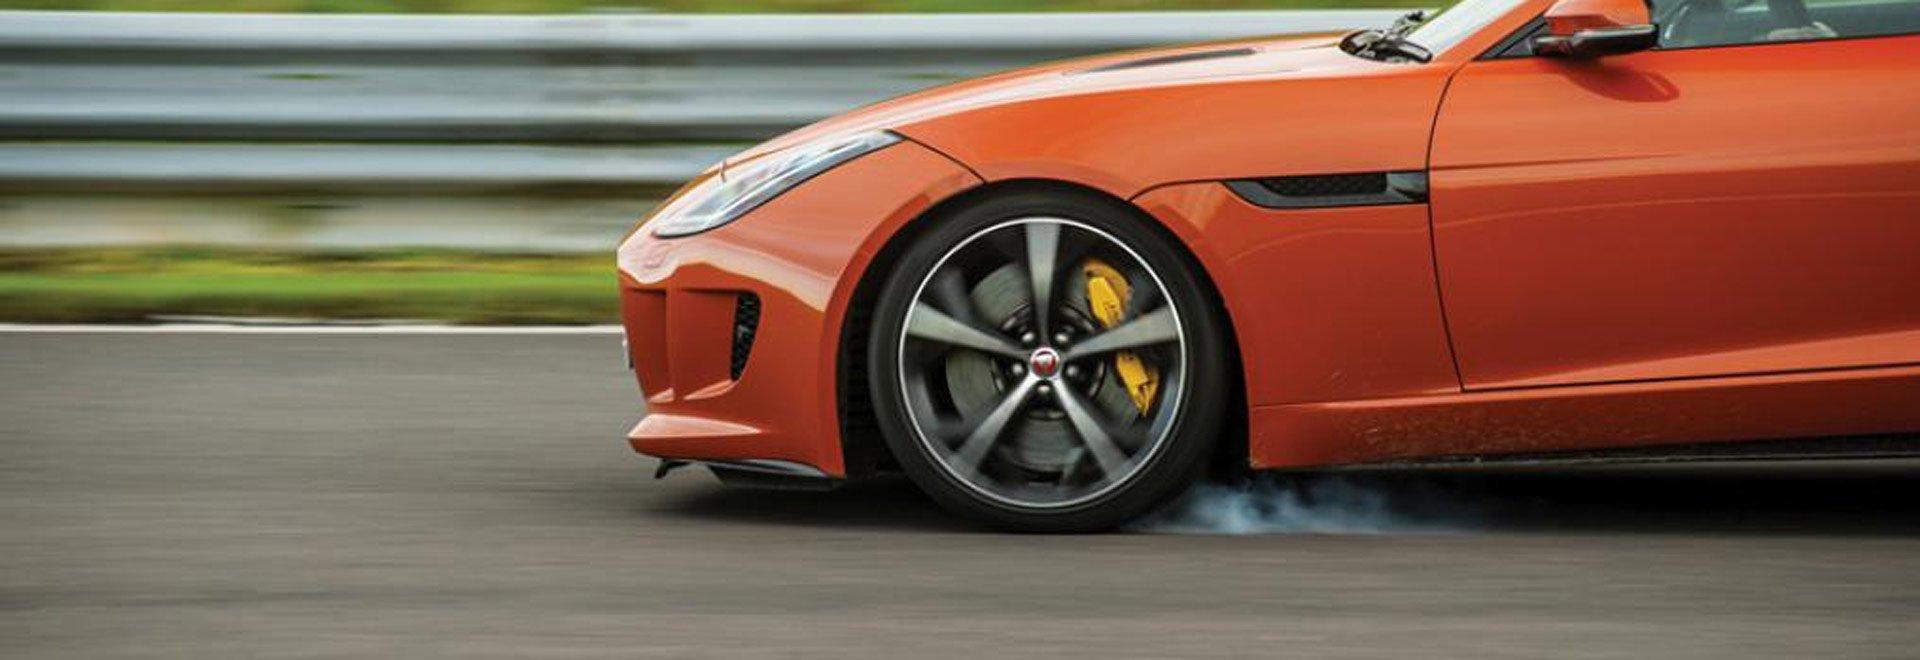 aussie brake and clutch automobile parts